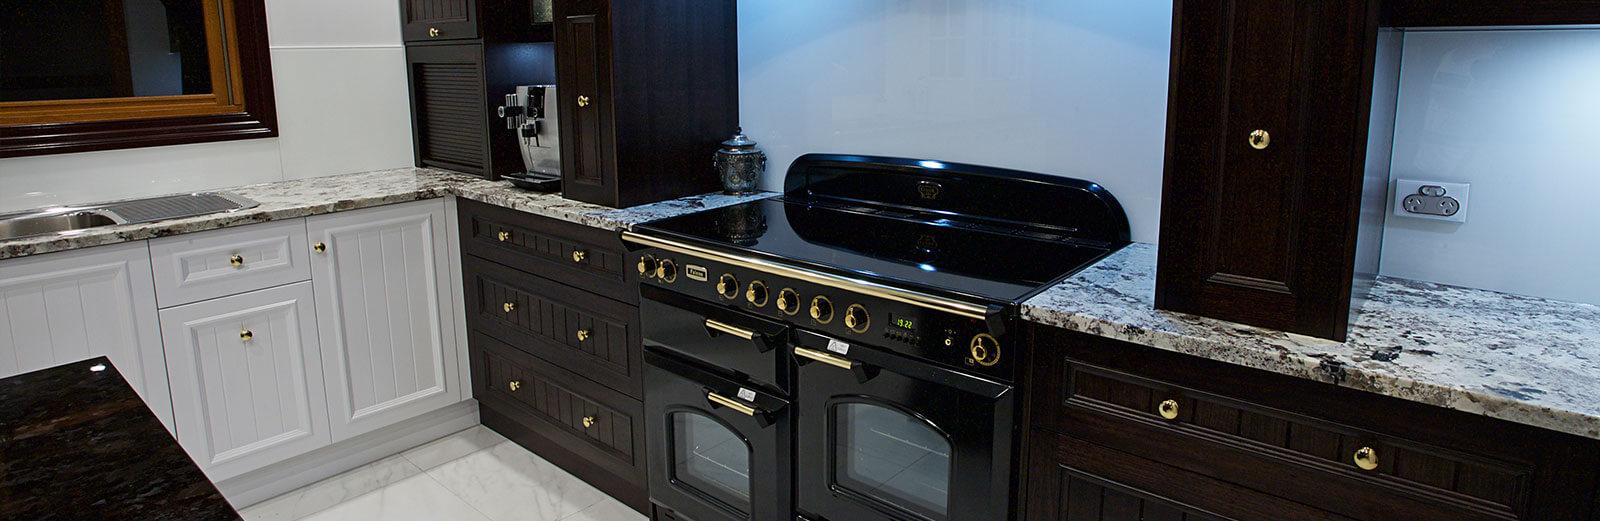 Acura Developments Flat Pac Kitchens